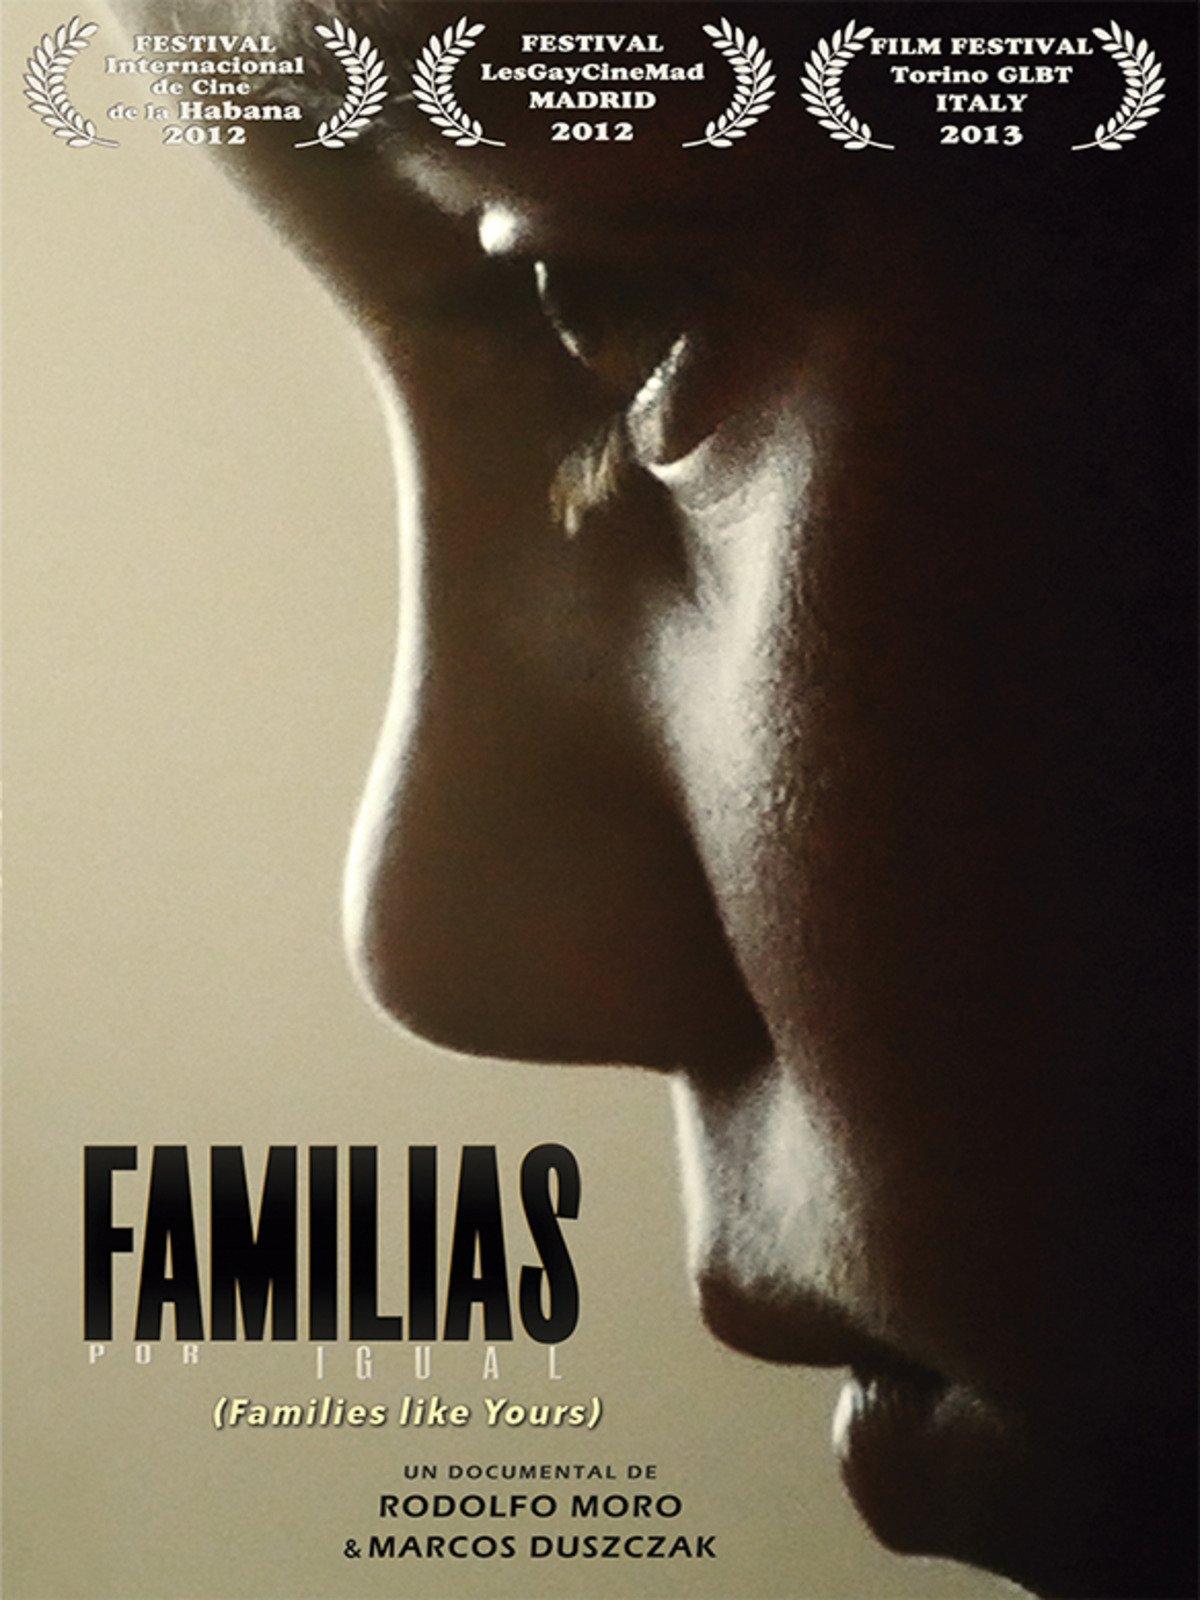 Familias por Igual (Families Like Yours)